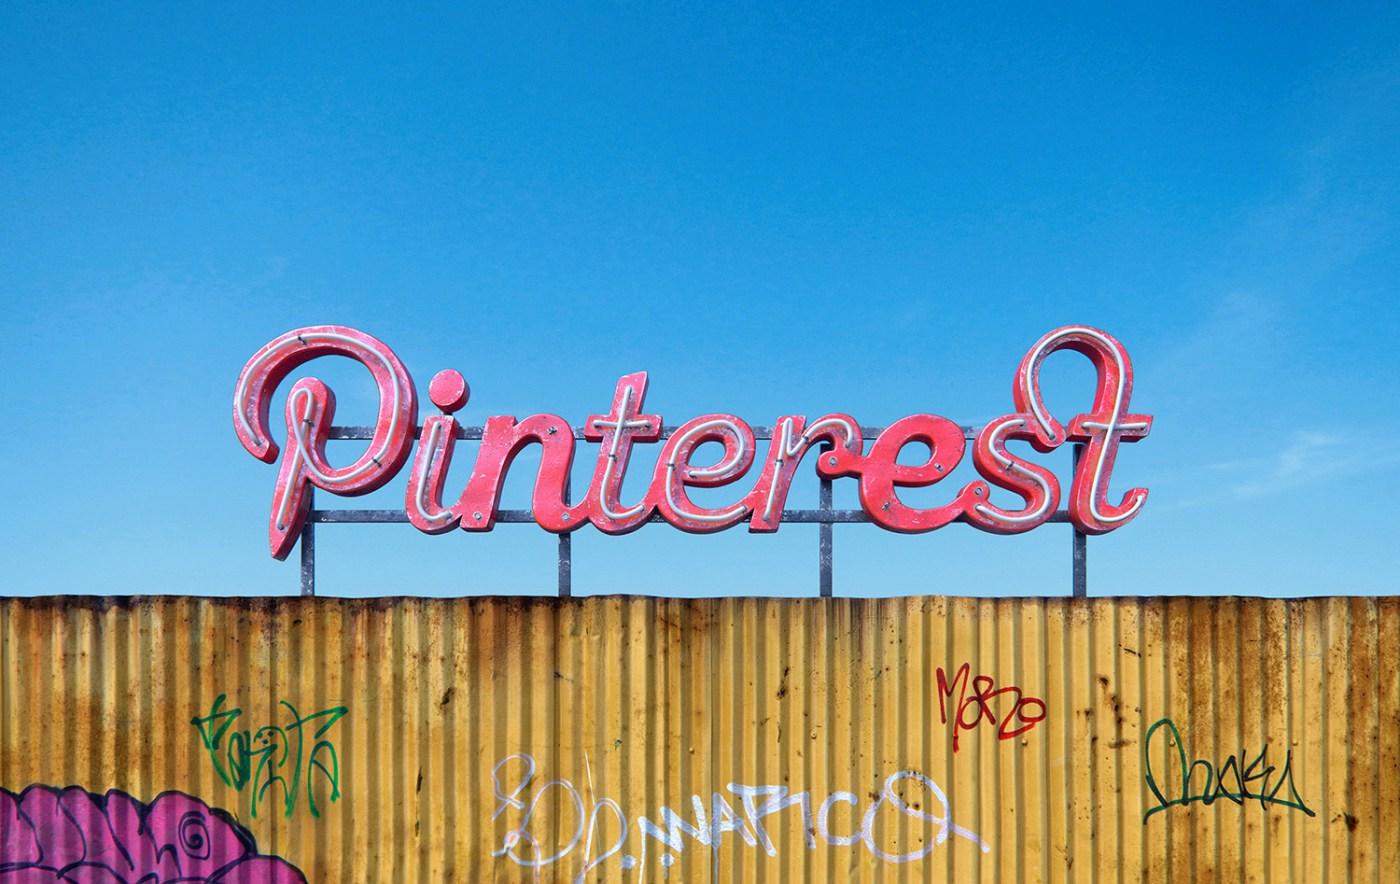 AndreiLacatusu social decay lettres logo enseigne typographie urbain urbex pinterest - Social decay : les logos de Twitter, Facebook et Tinder transformés en enseignes vintage